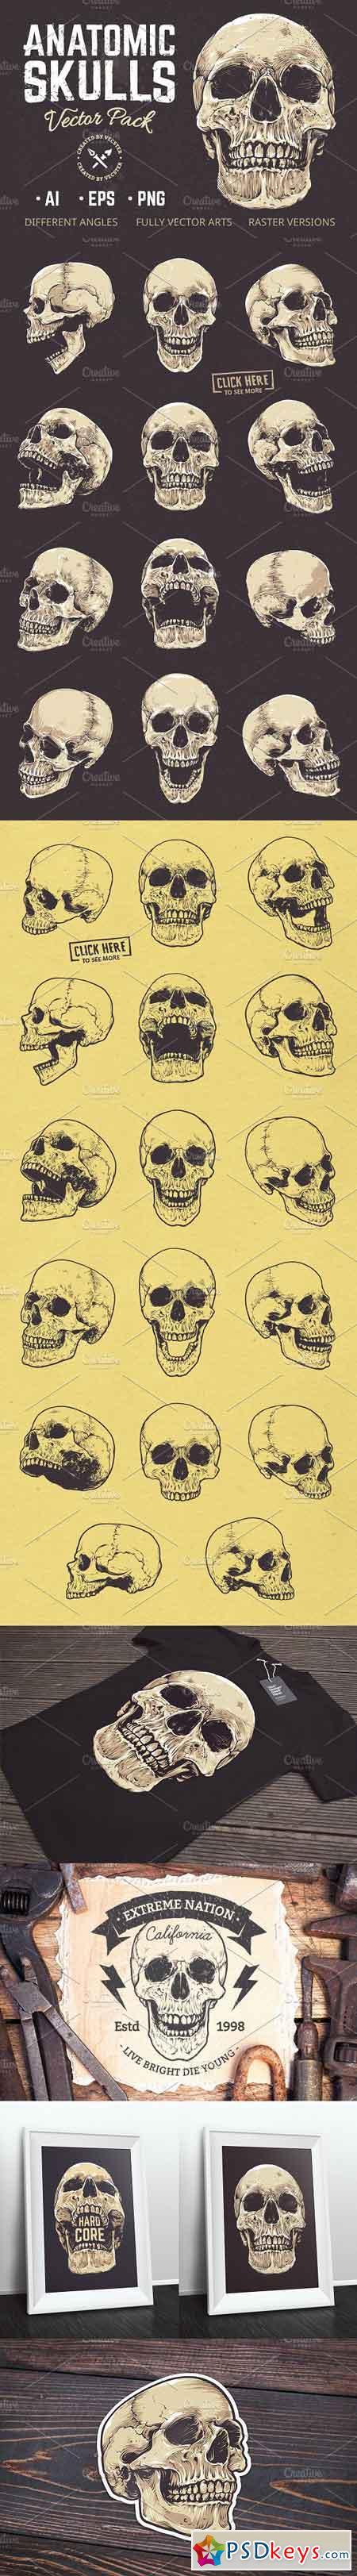 Anatomic Skulls Vector Pack 1181336